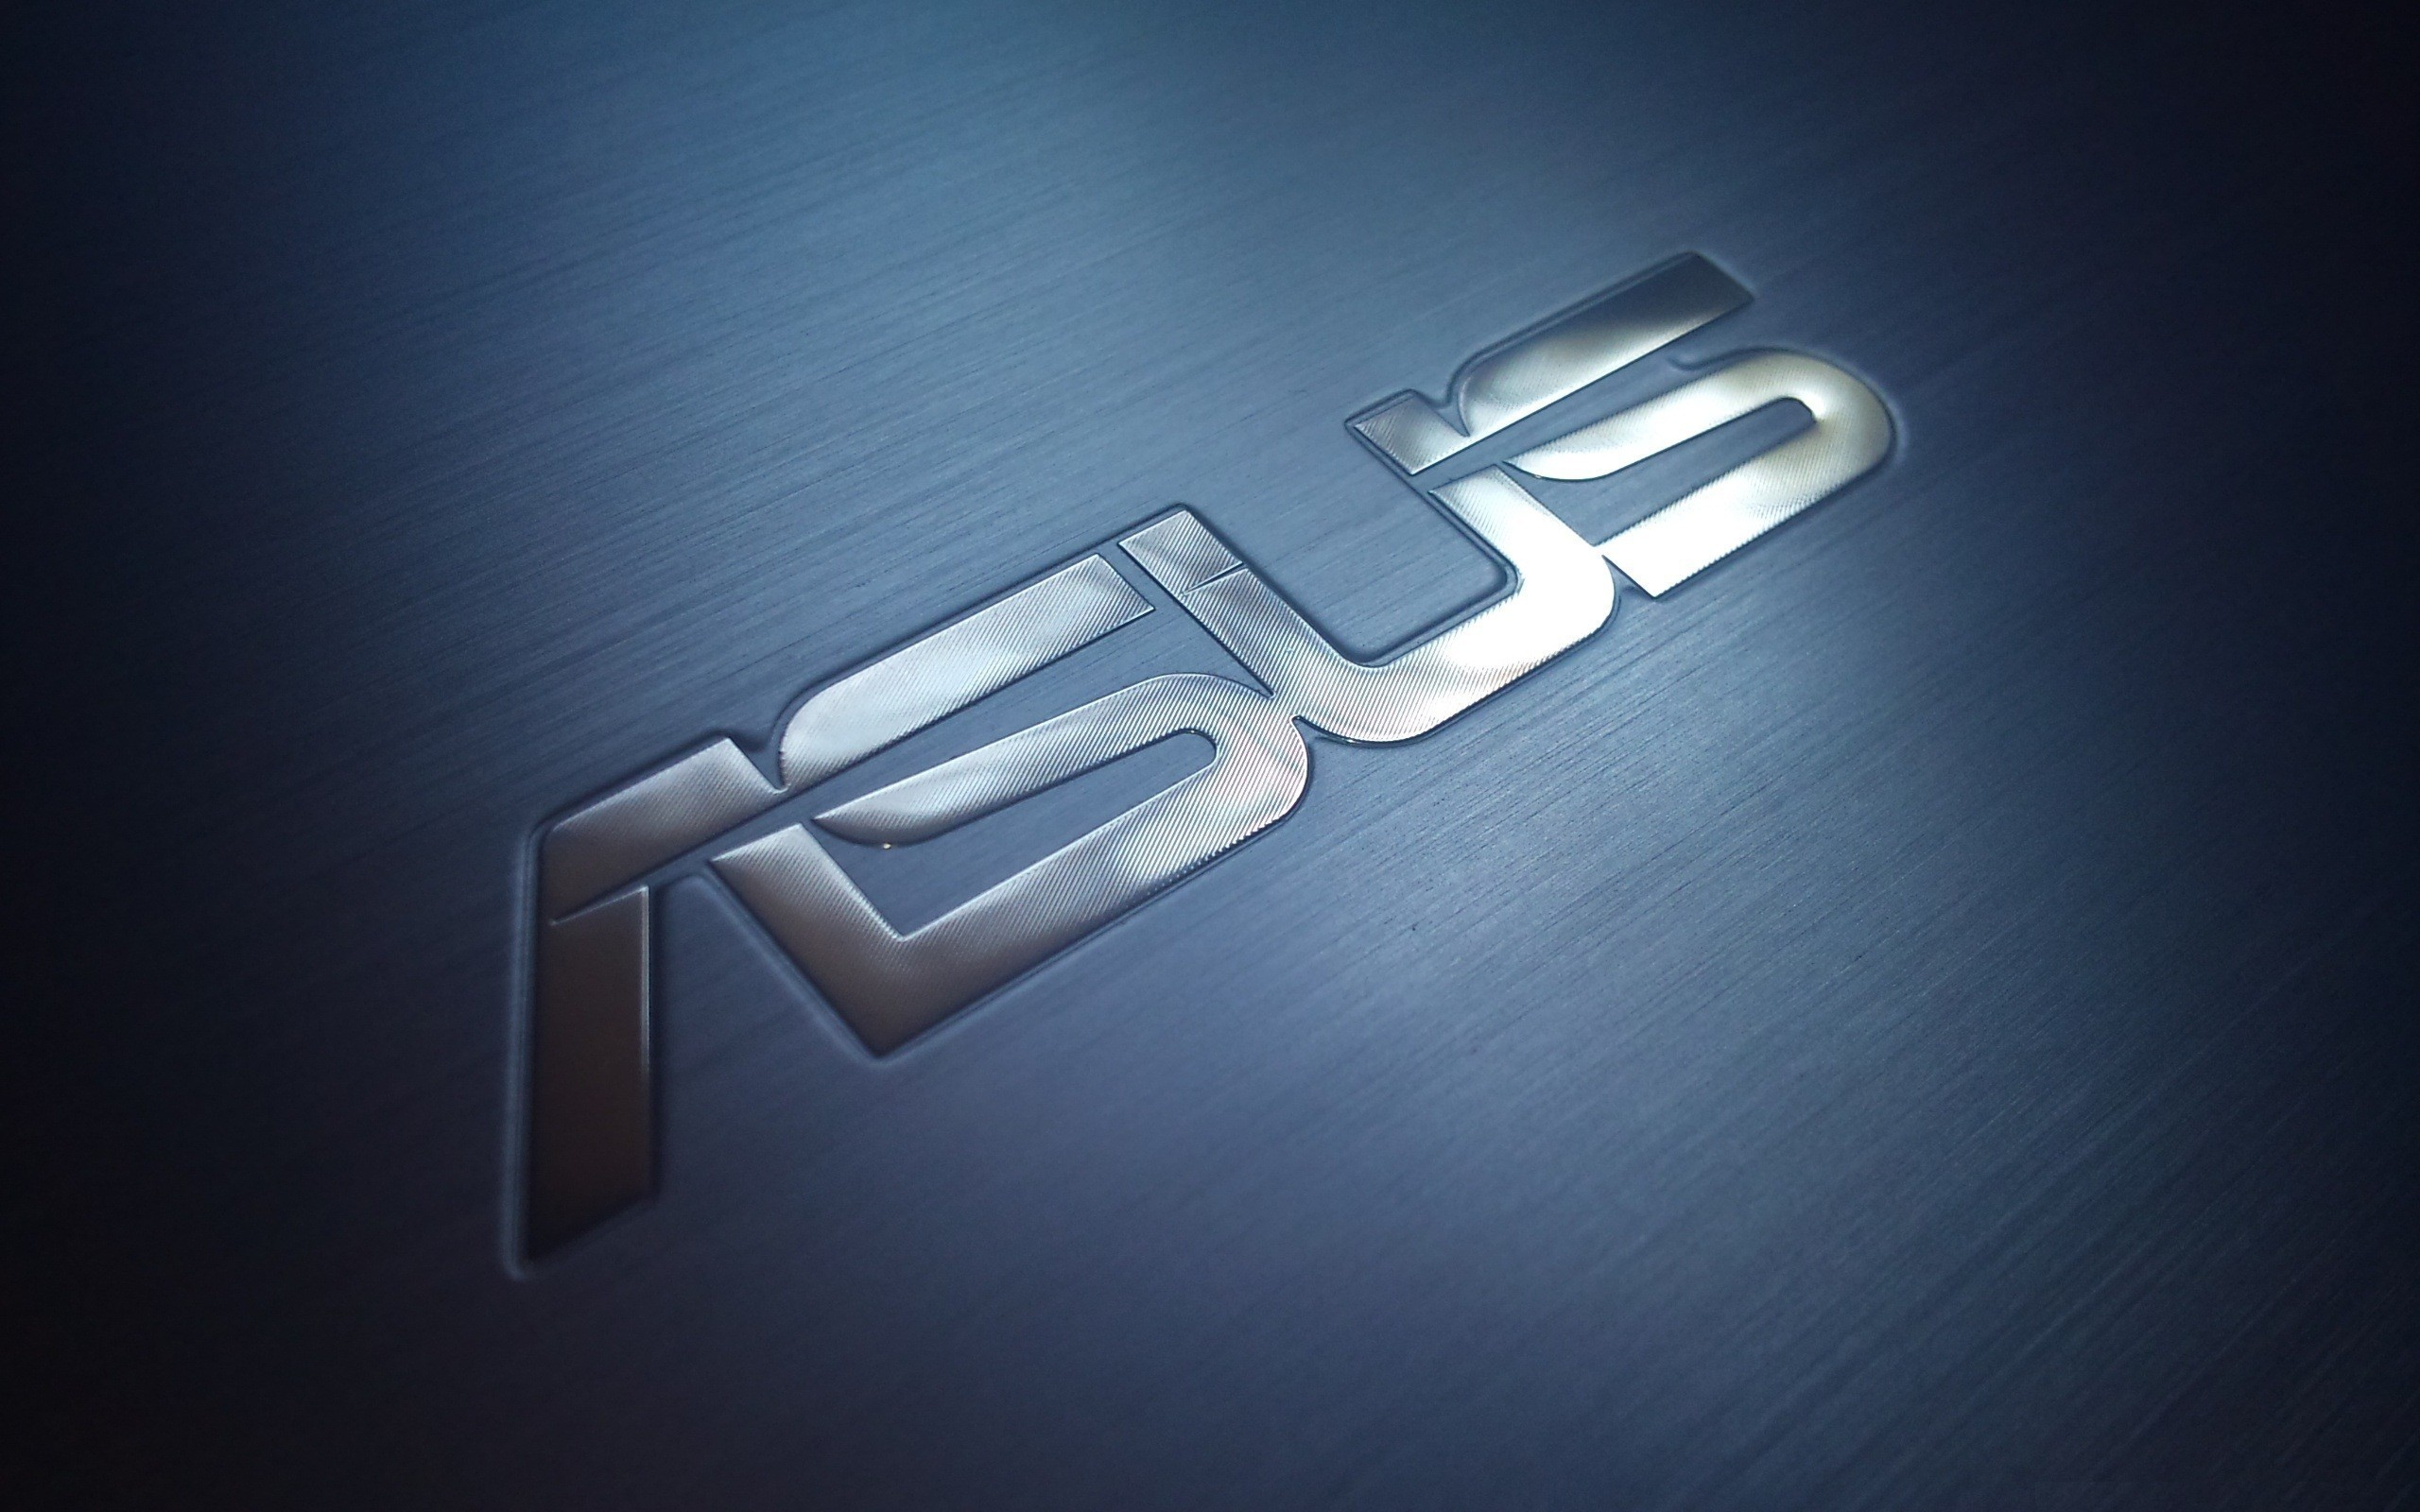 Asus 2560×1440 Resolution